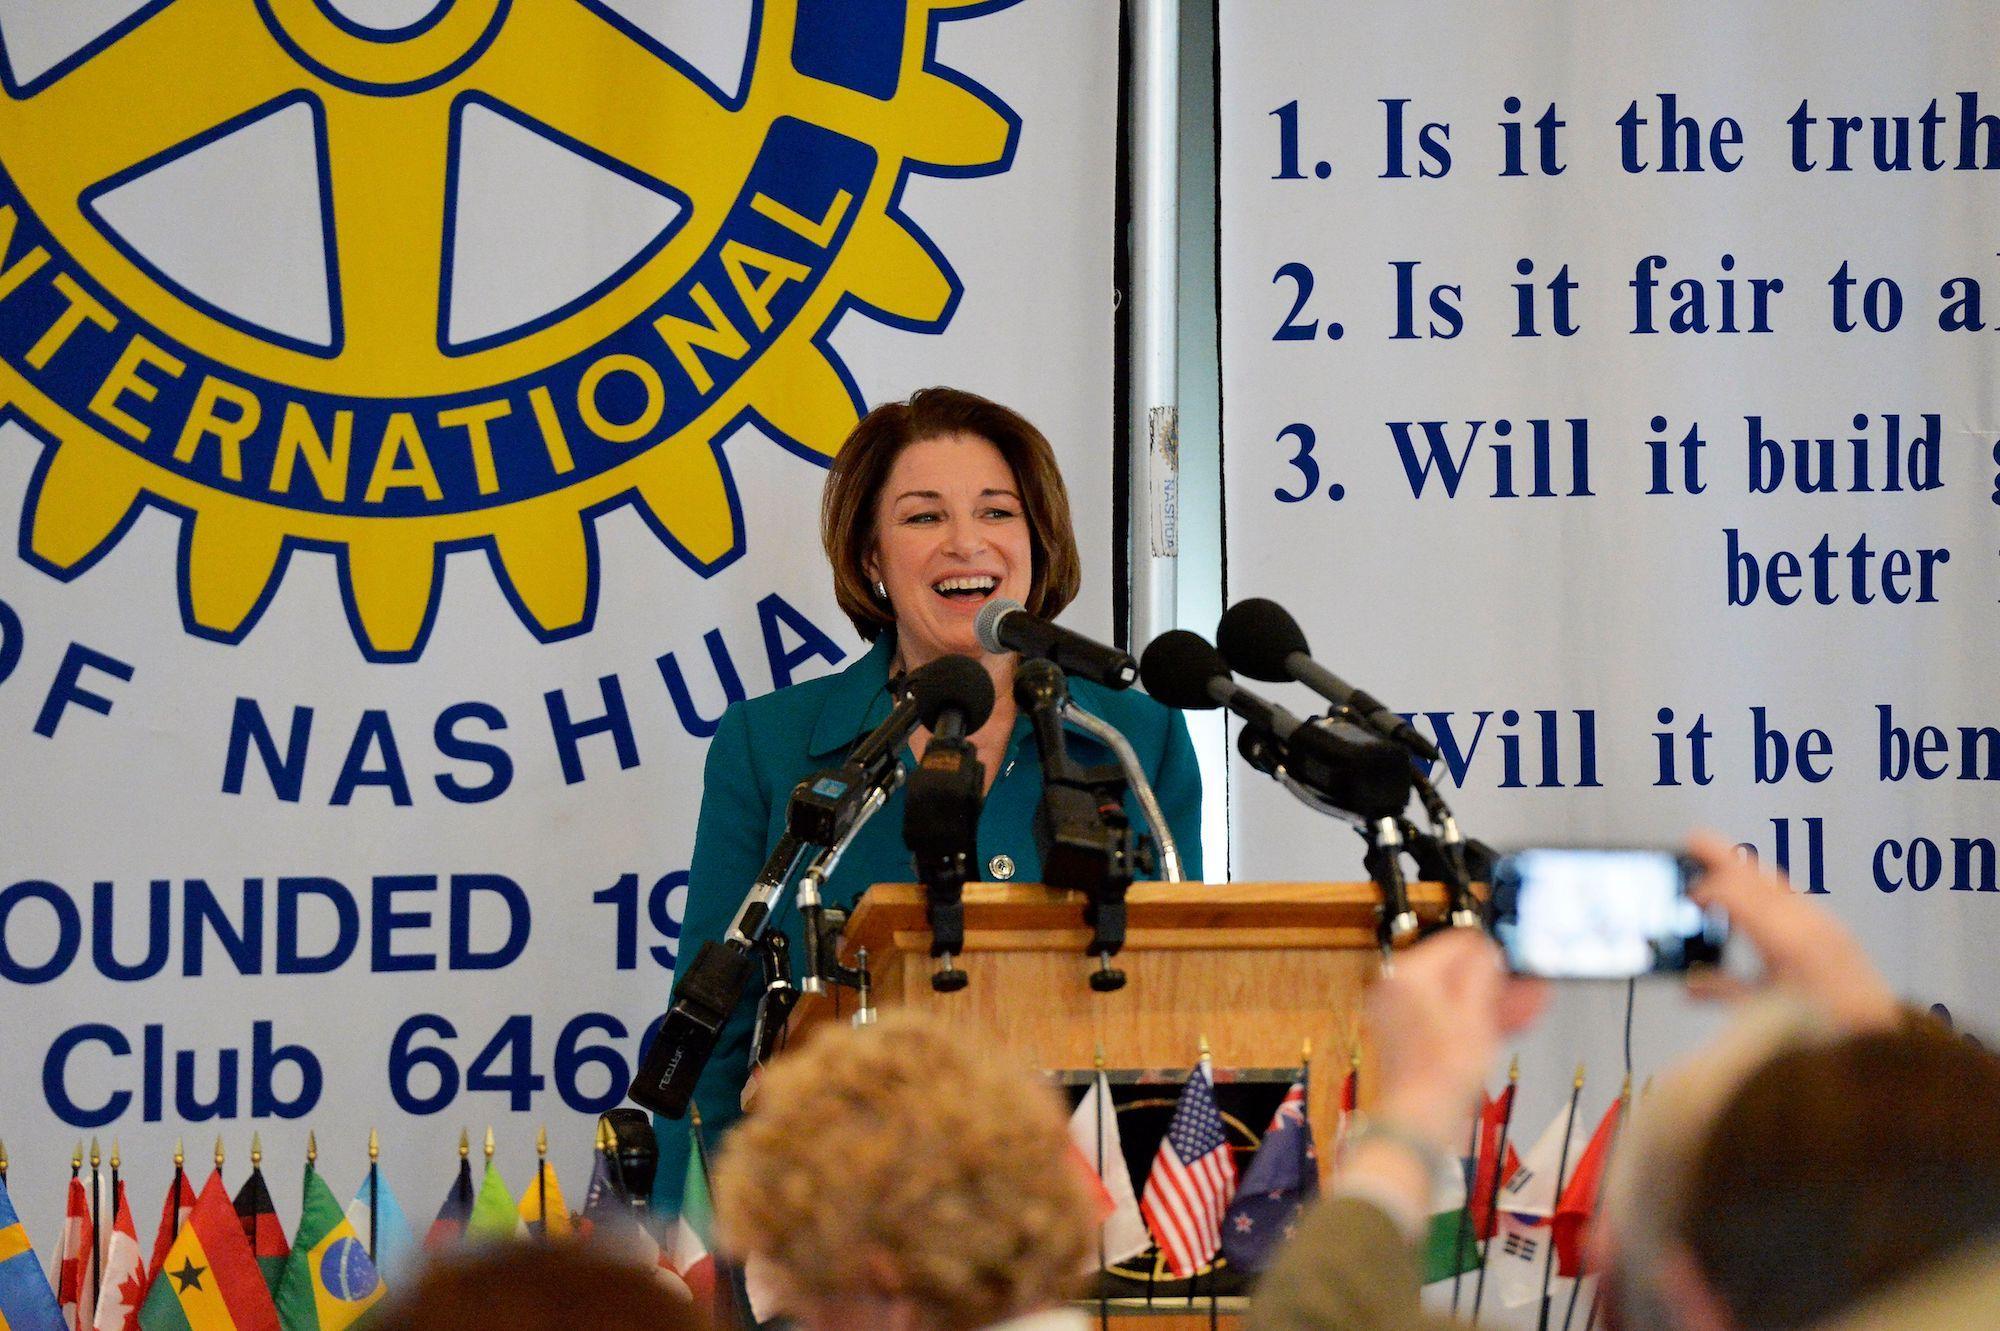 Amy Klobuchar Is Now Taking Some Cues From Elizabeth Warren Rather Than Joe Biden